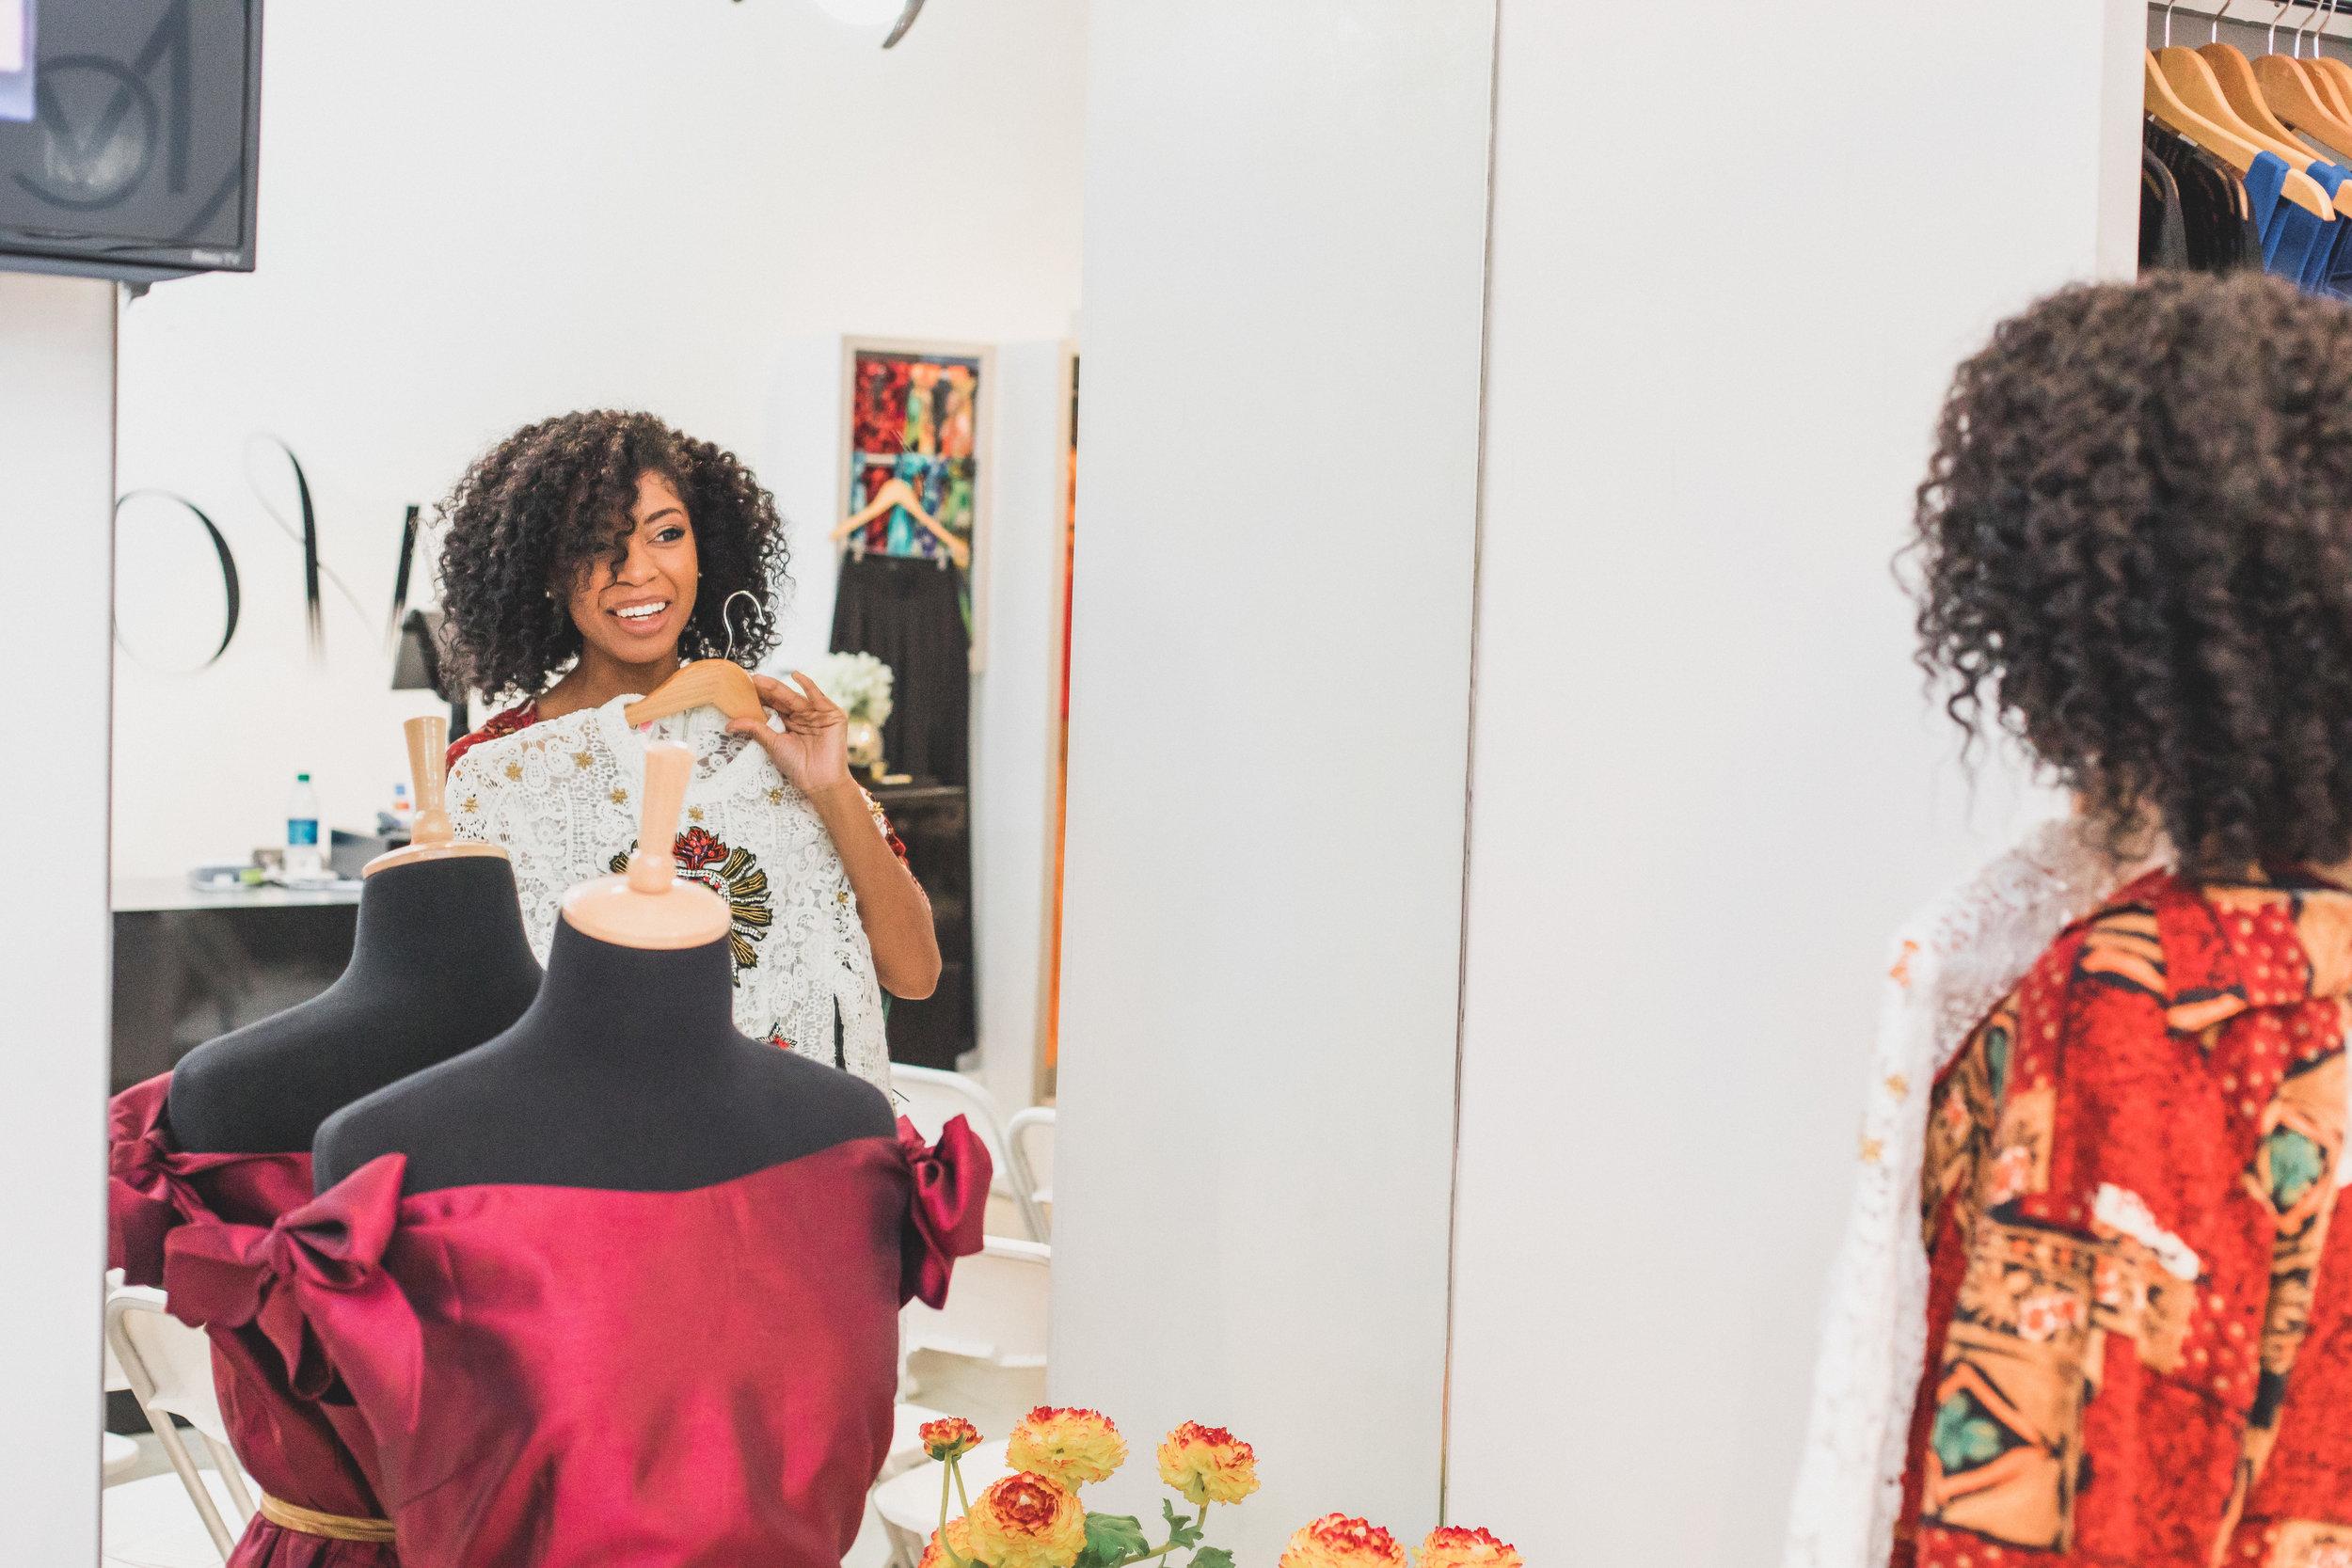 mod-chic-couture-houston-texas-boutique